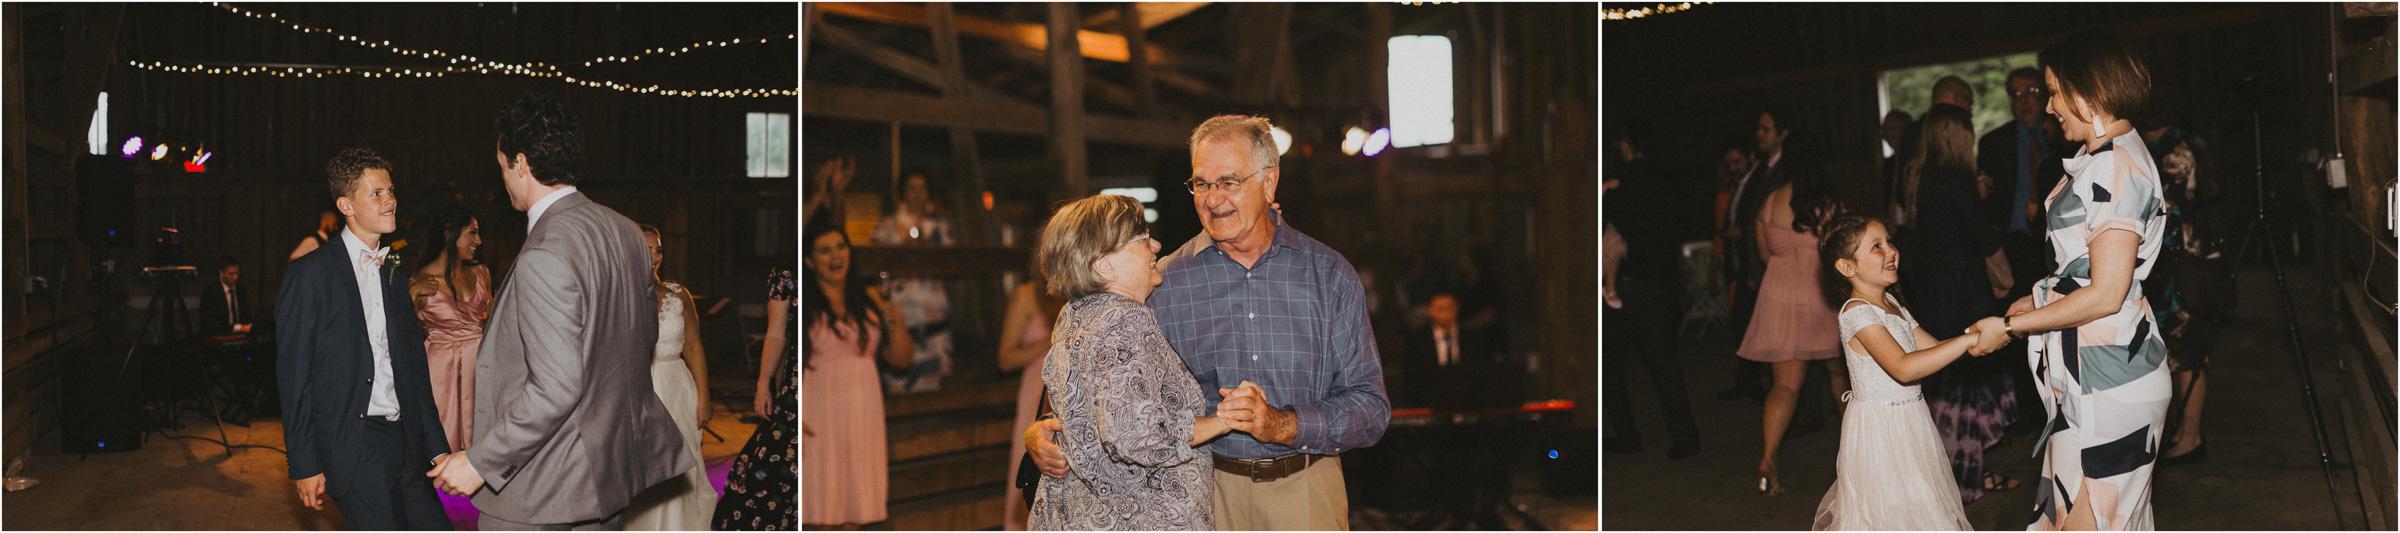 alyssa barletter photography nelson wedding nebraska city lied lodge morton barn spring wedding photographer-65.jpg